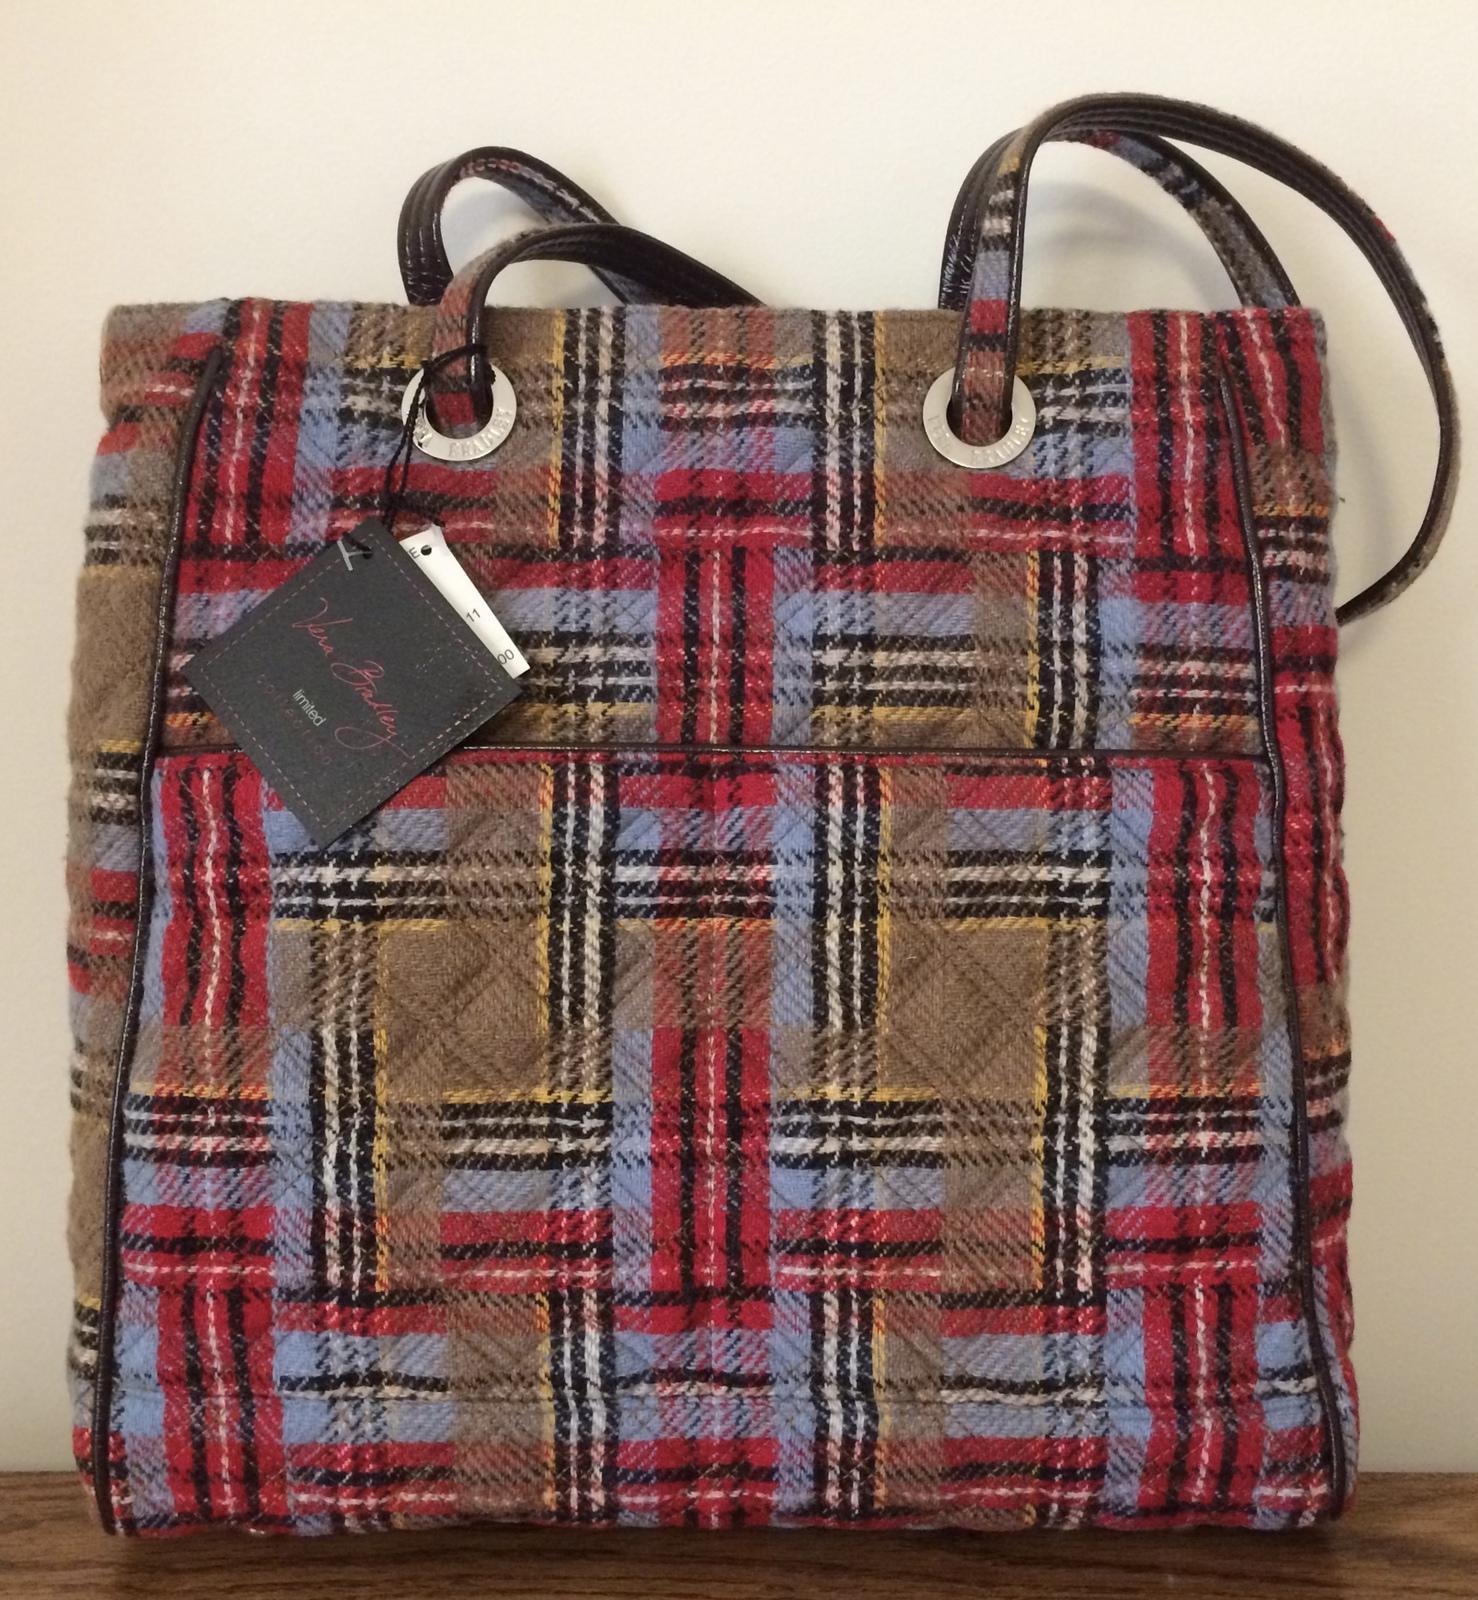 Vera Bradley Three Pocket Tote Patchwork Plaid Bag Zippers Nwt Unused Retired